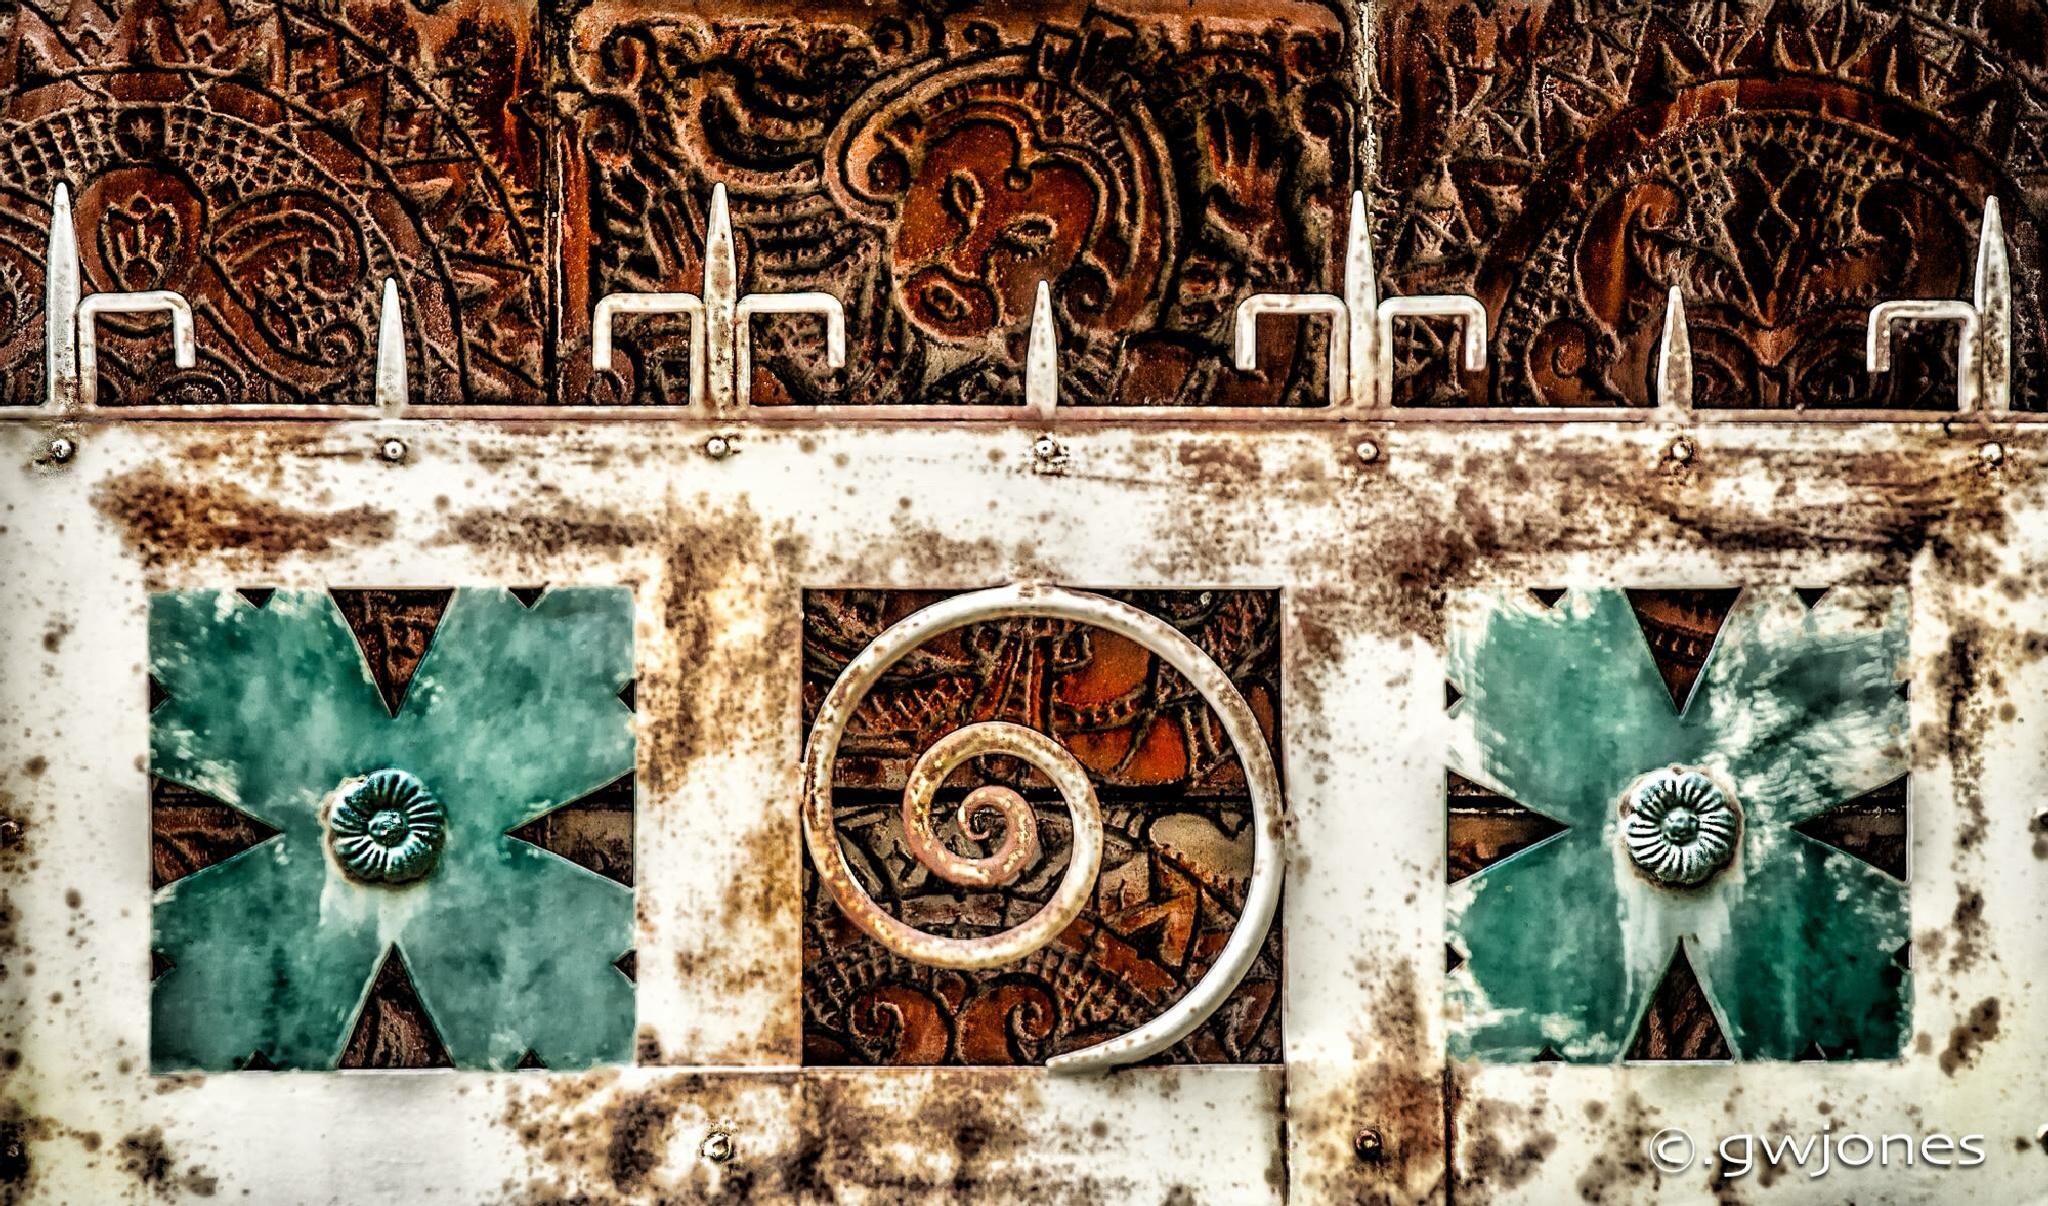 Mayan Gate by gwjones317